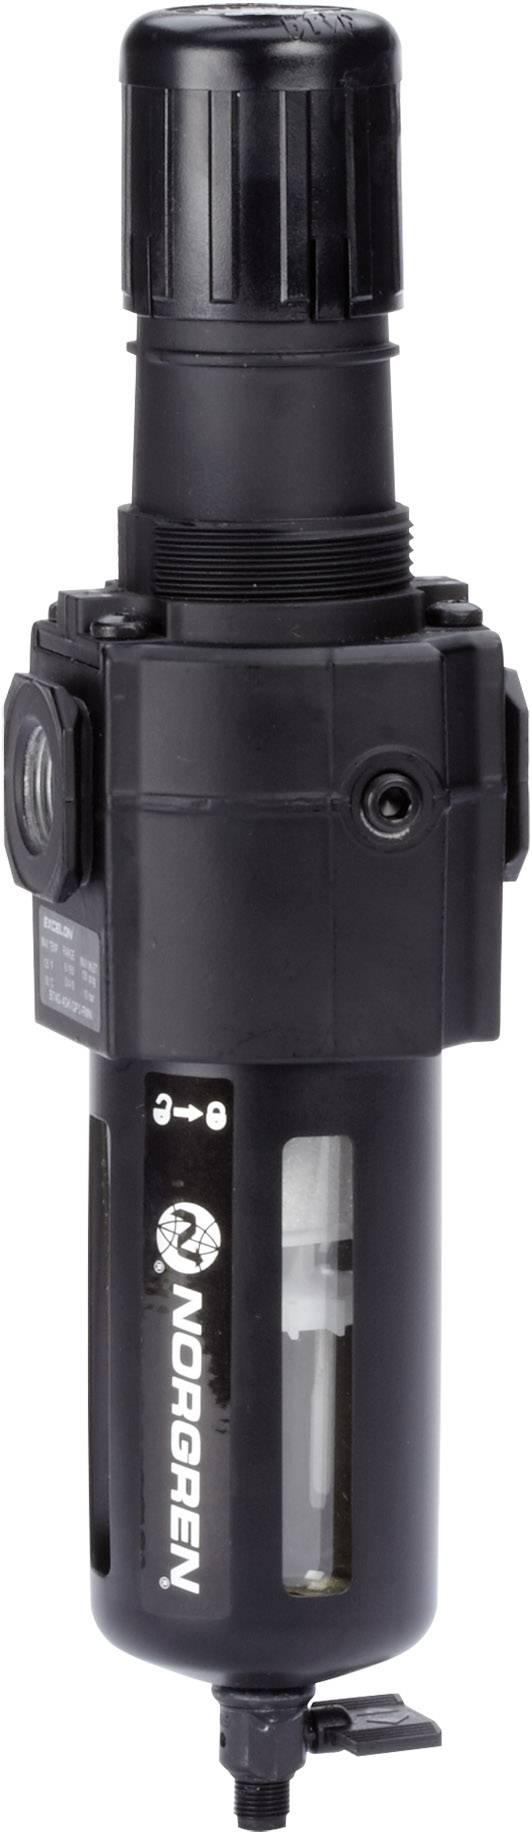 "Regulátor filtru Norgren B72G-2GK-QT3-RMN, 1/4"", 10 bar"